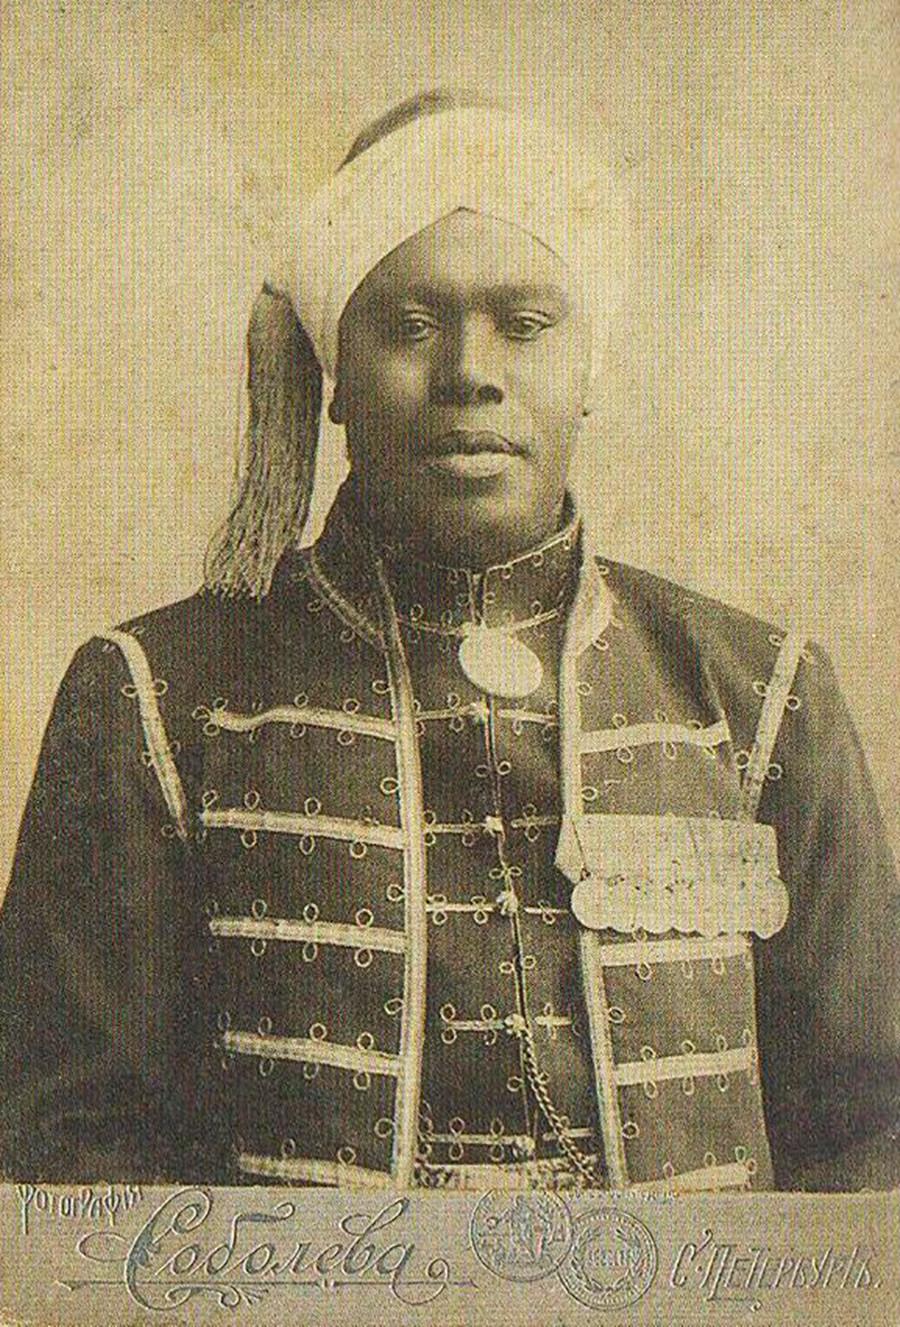 George Maria z Zelenortskih otokov